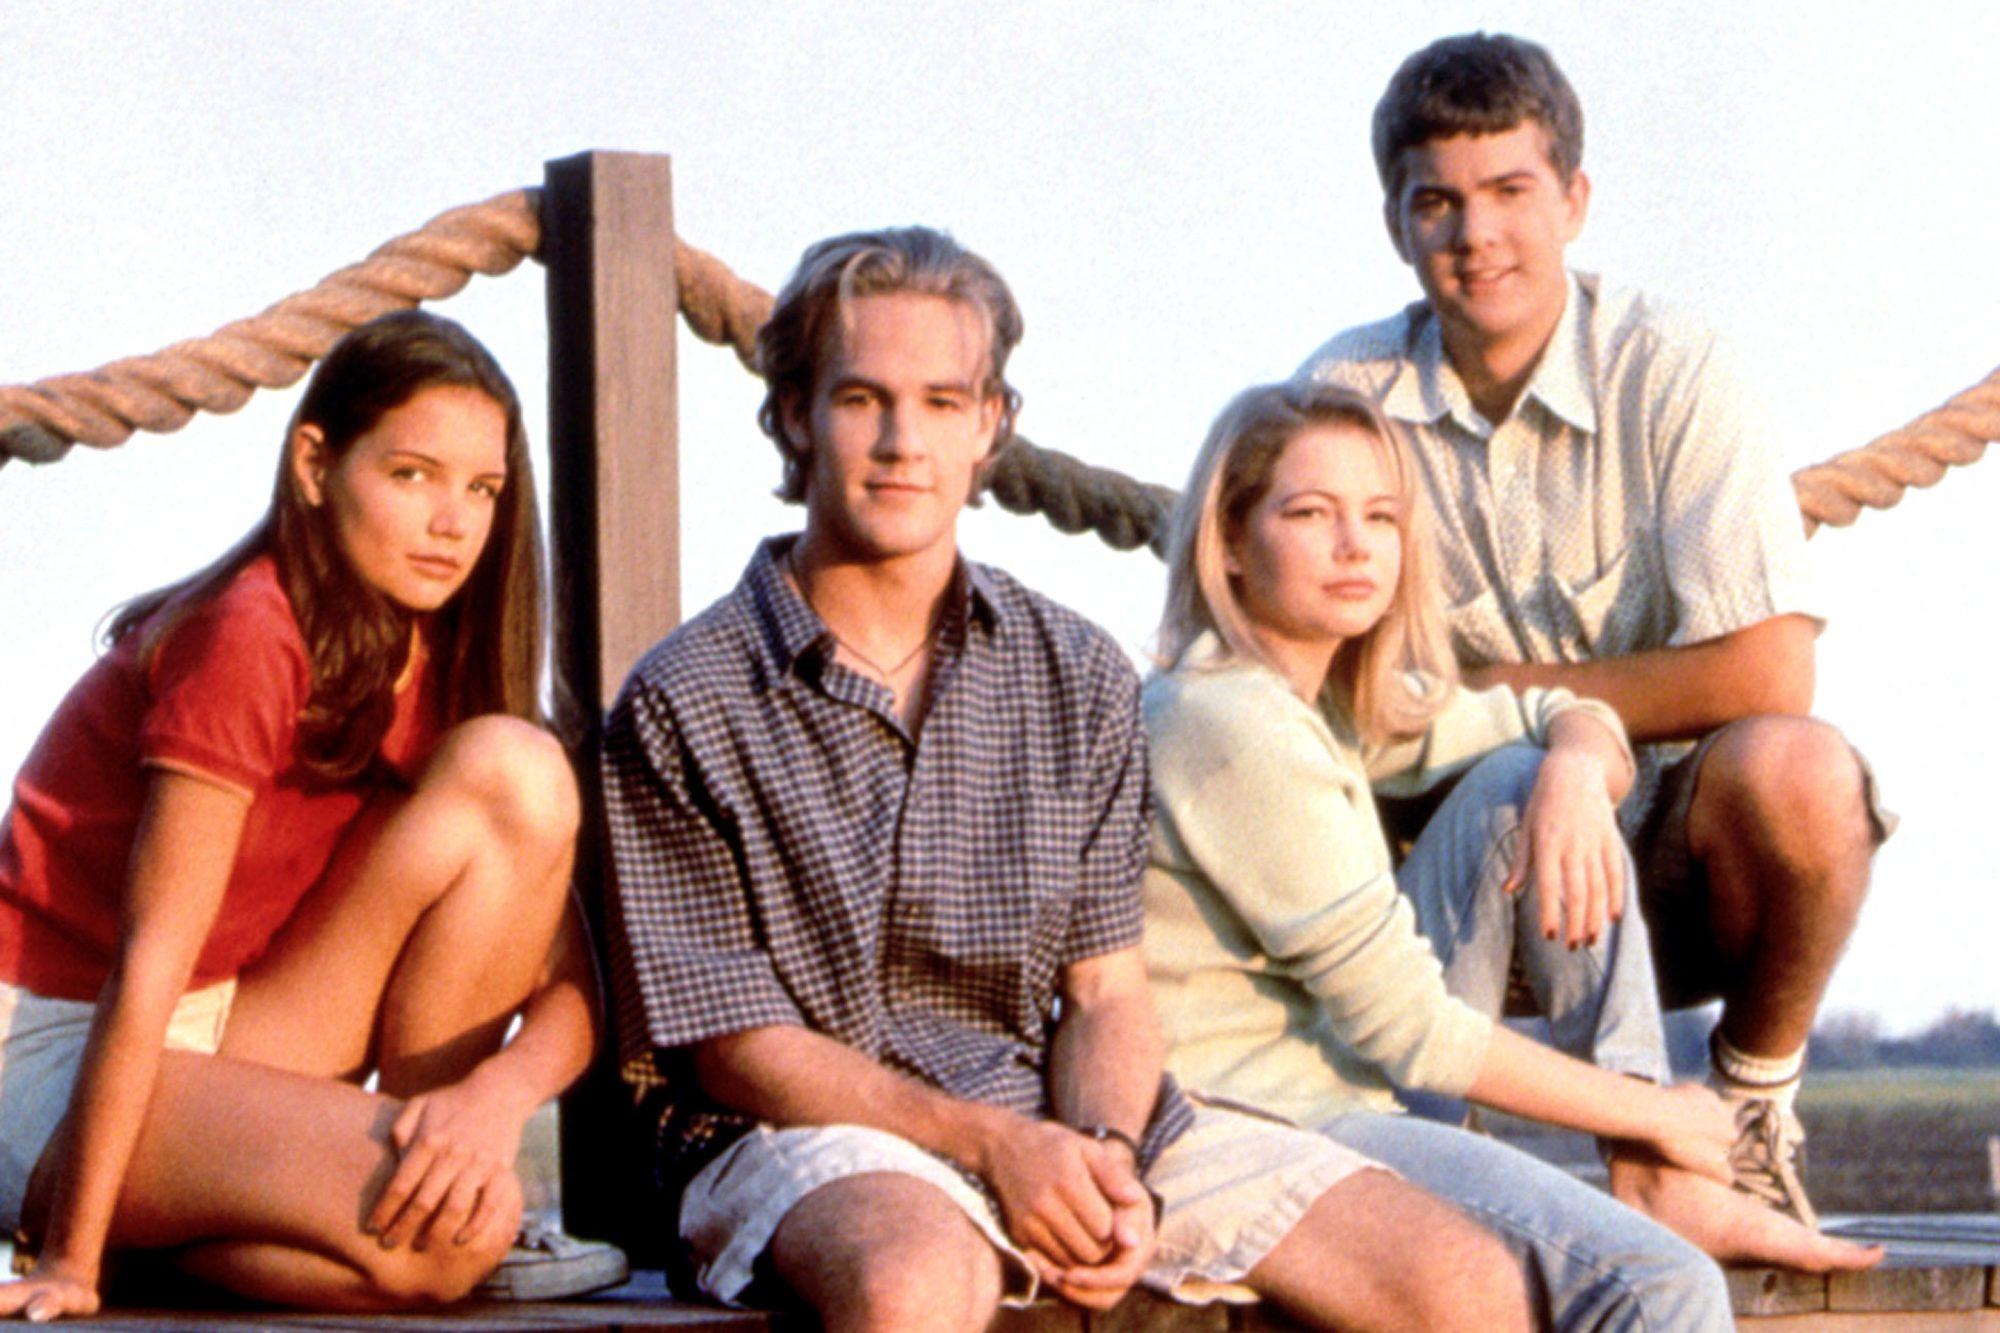 DAWSON'S CREEK, Katie Holmes, James Van Der Beek, Michelle Williams, Joshua Jackson, (Season 1), 199